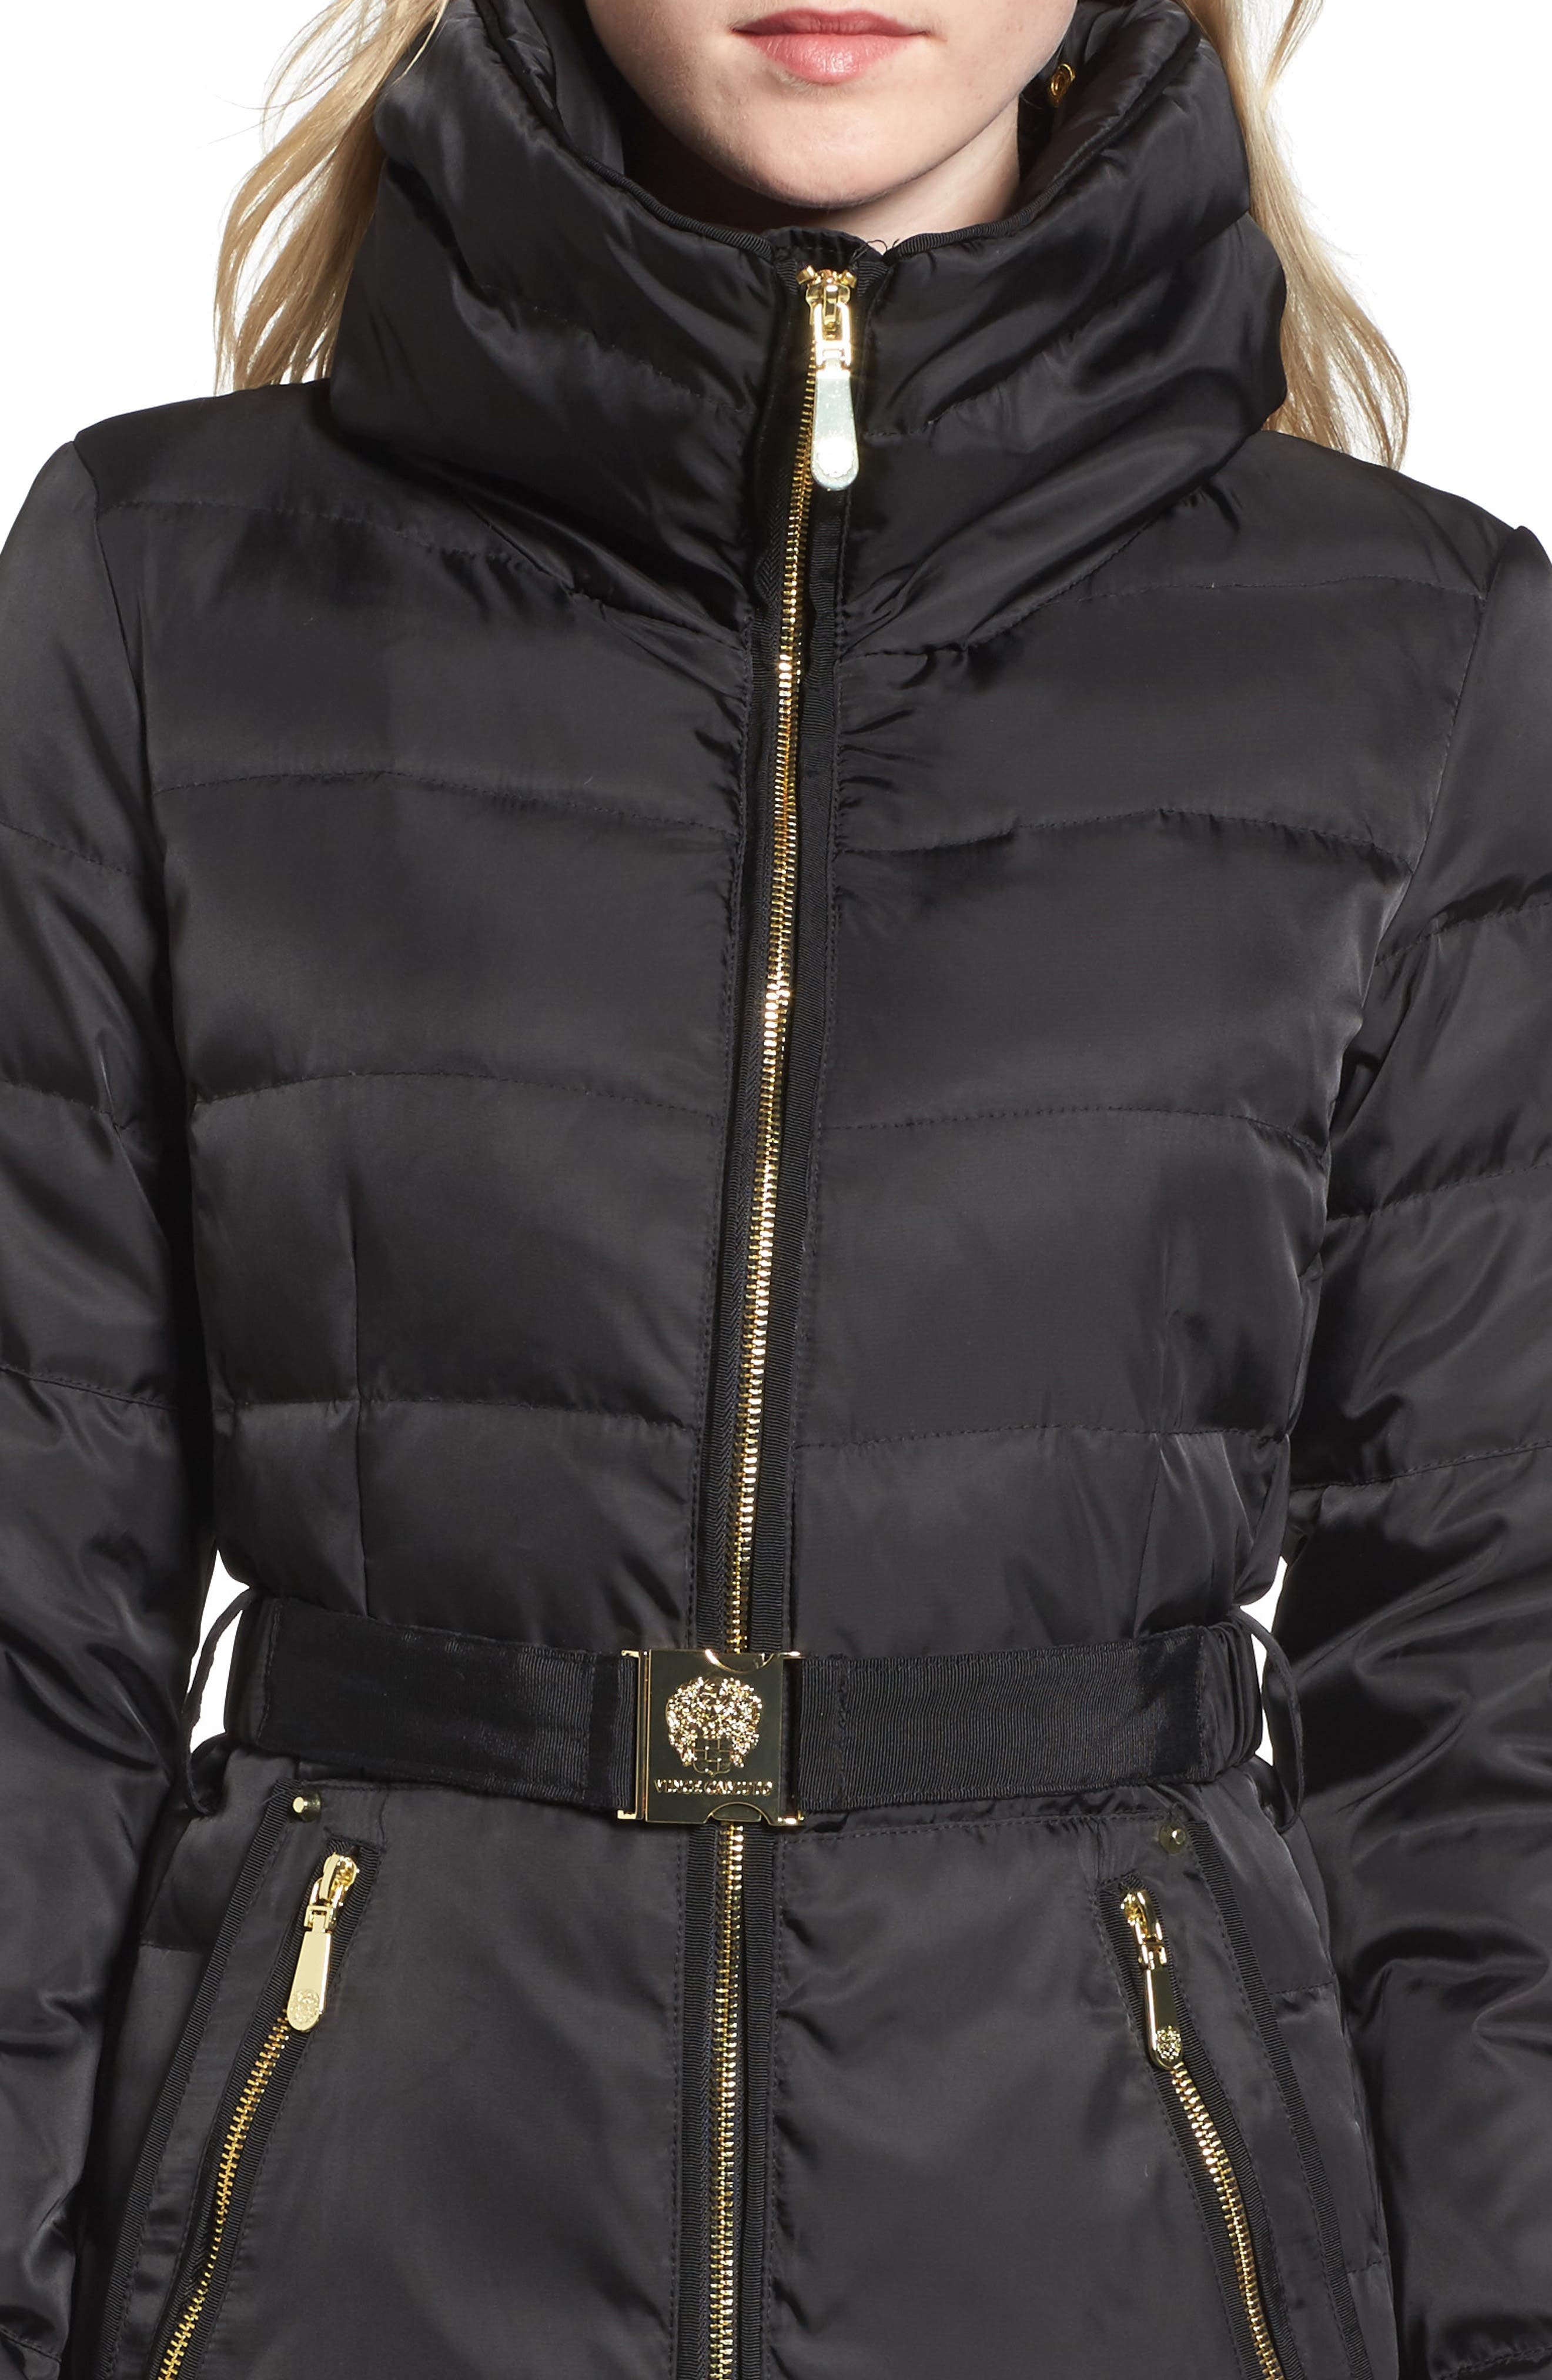 Belted Coat with Detachable Faux Fur,                             Alternate thumbnail 4, color,                             Black